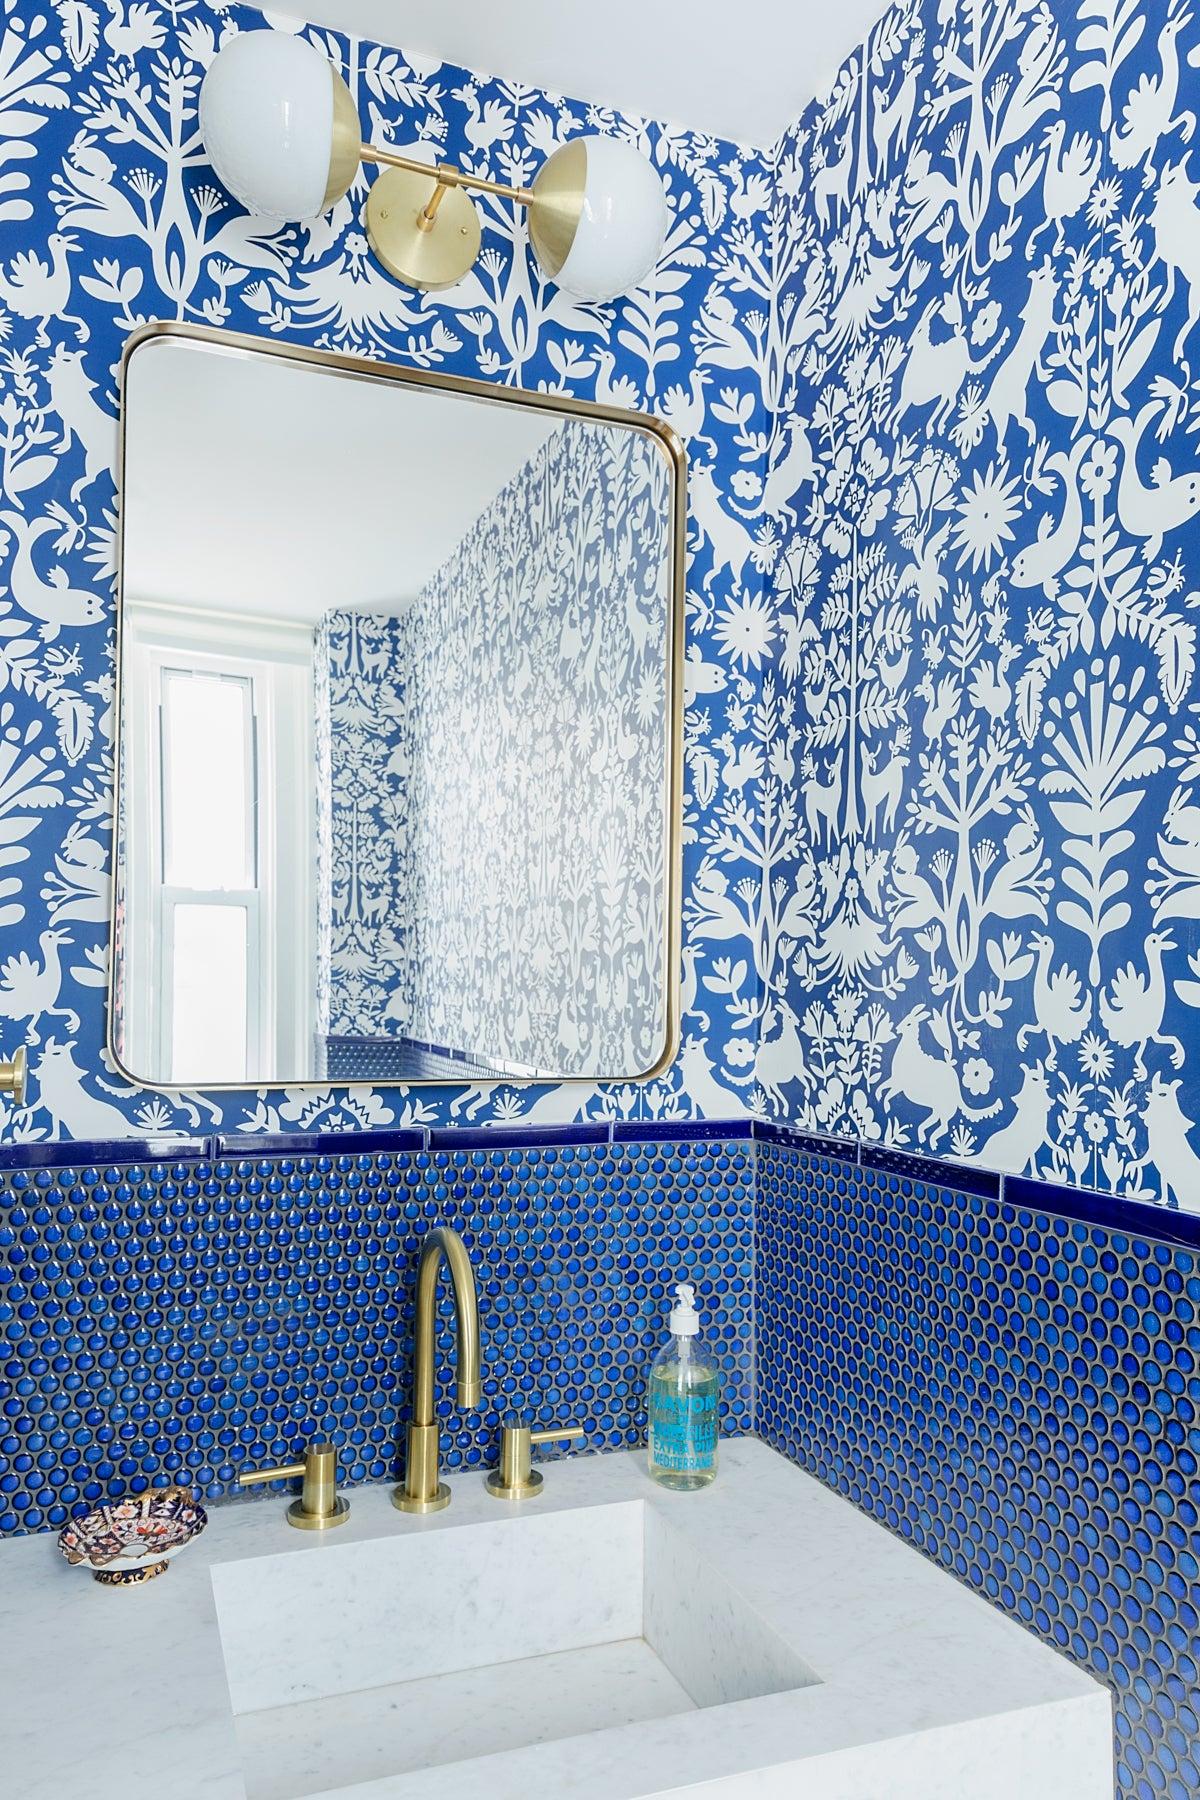 a bathroom designed with an all-blue theme